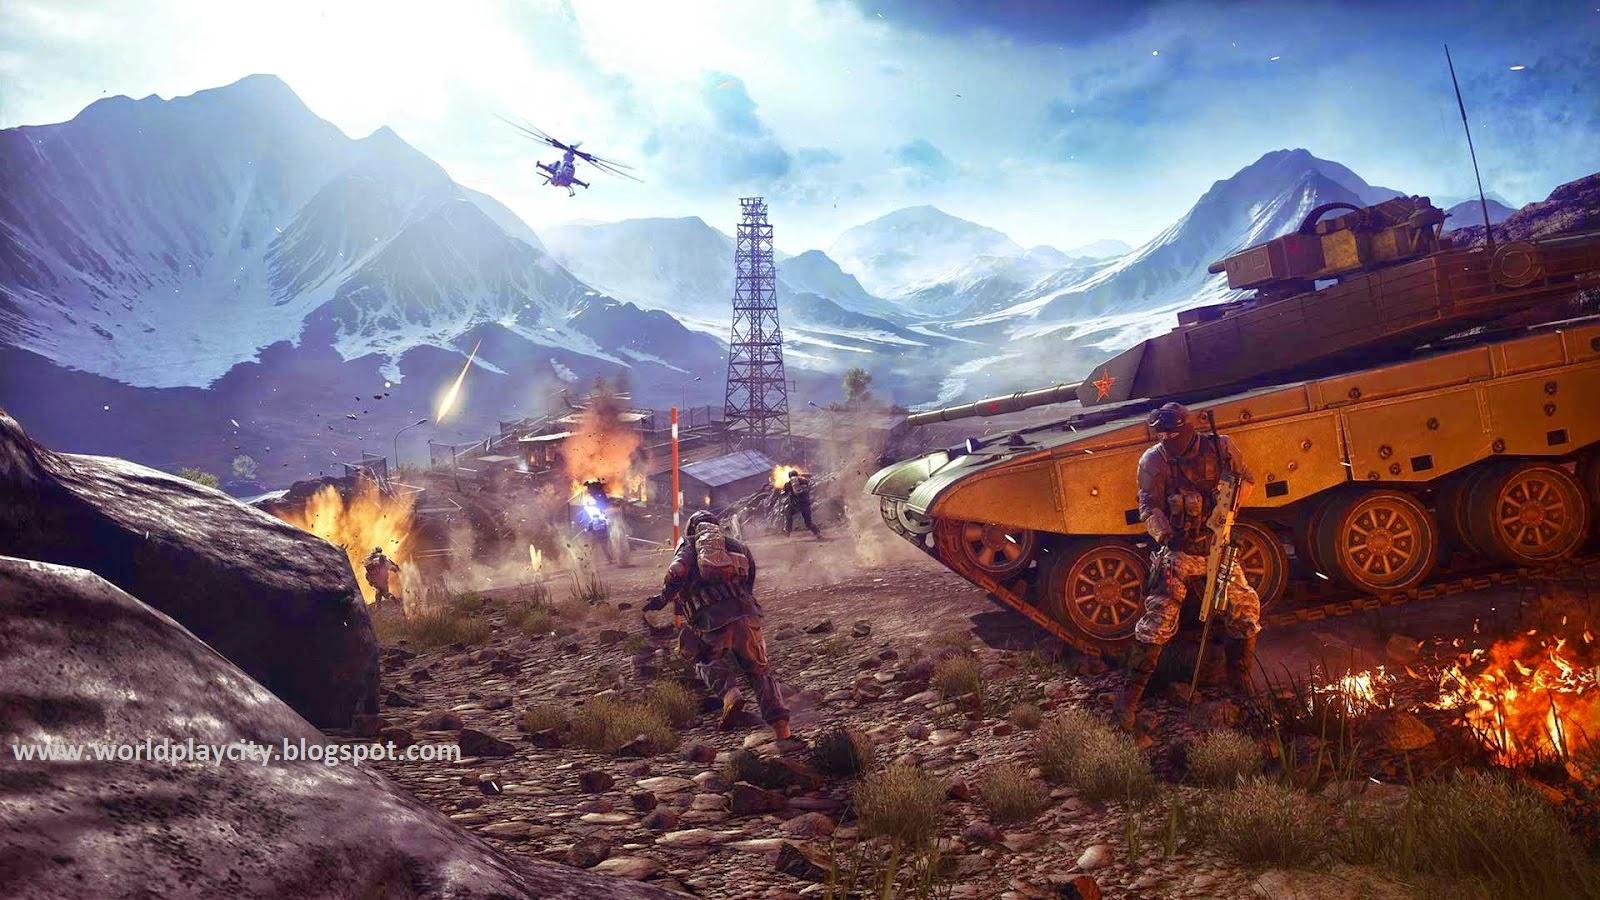 battlefield 4 play on windows 7 free download